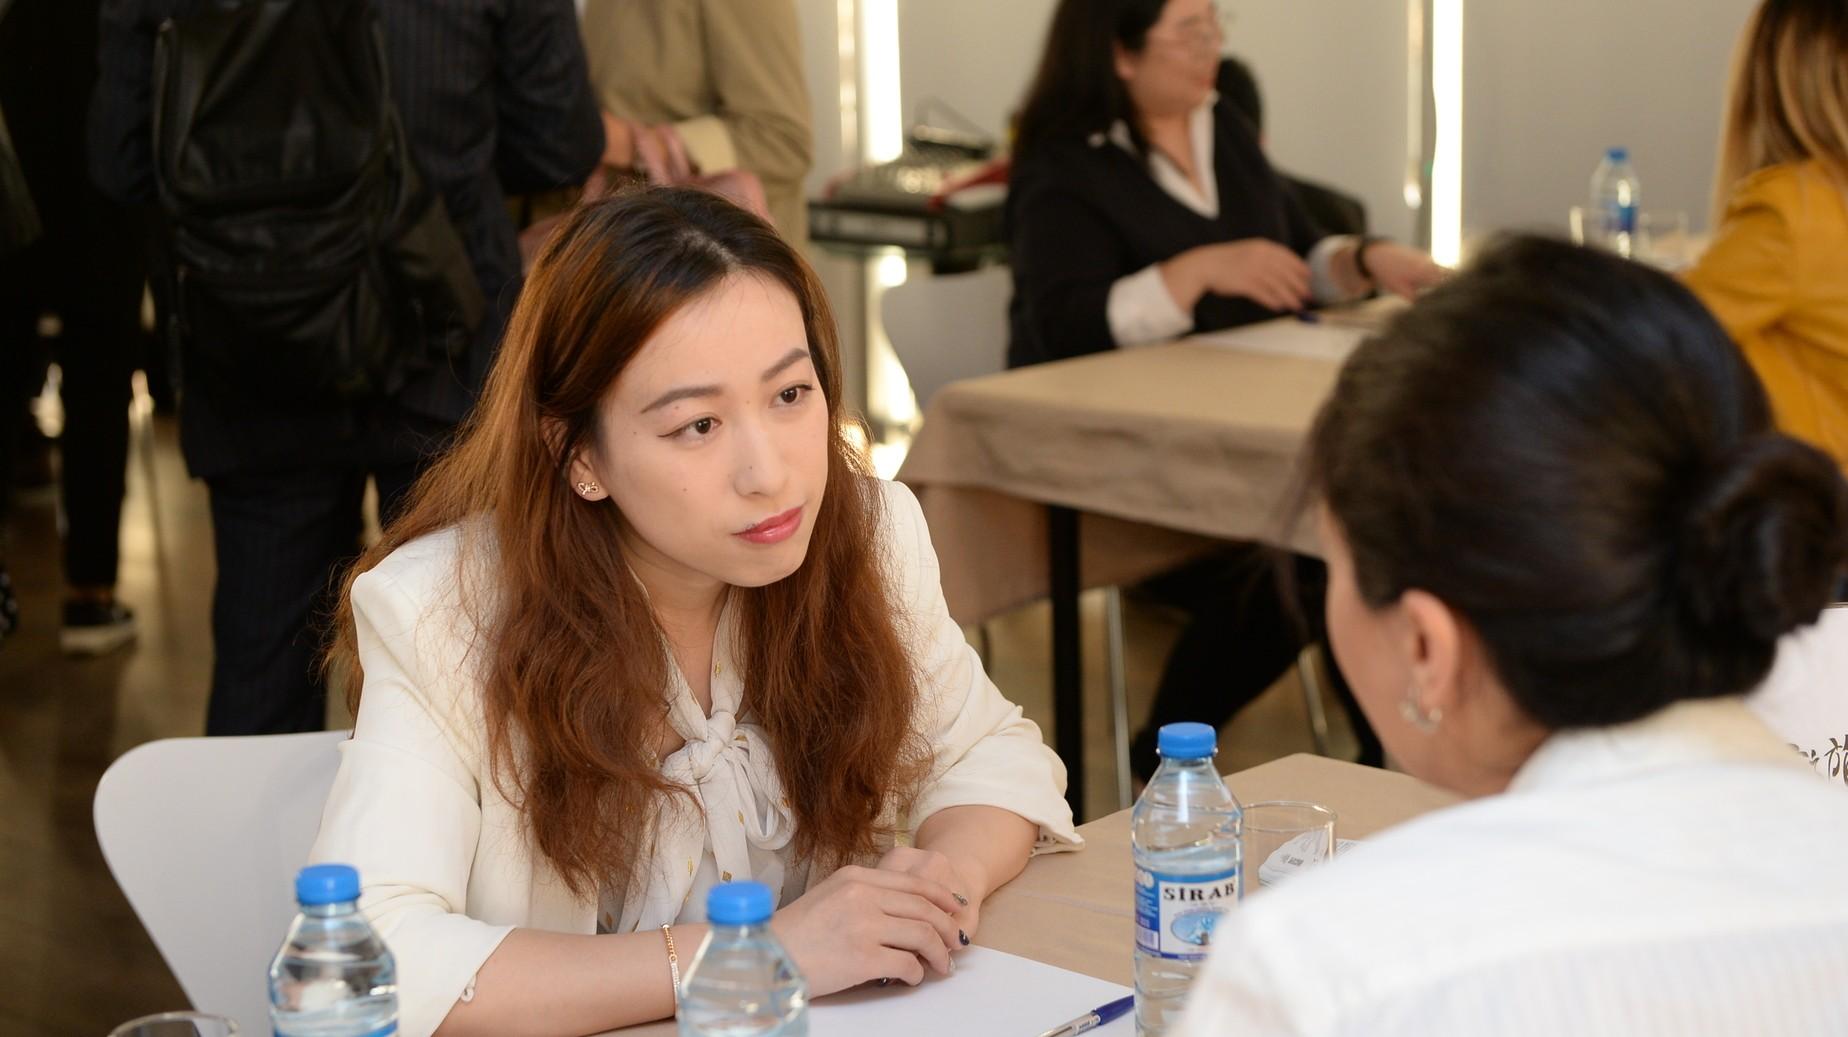 Çinin aparıcı turoperatorlarına Azərbaycanın turizm potensialı tanıdılıb